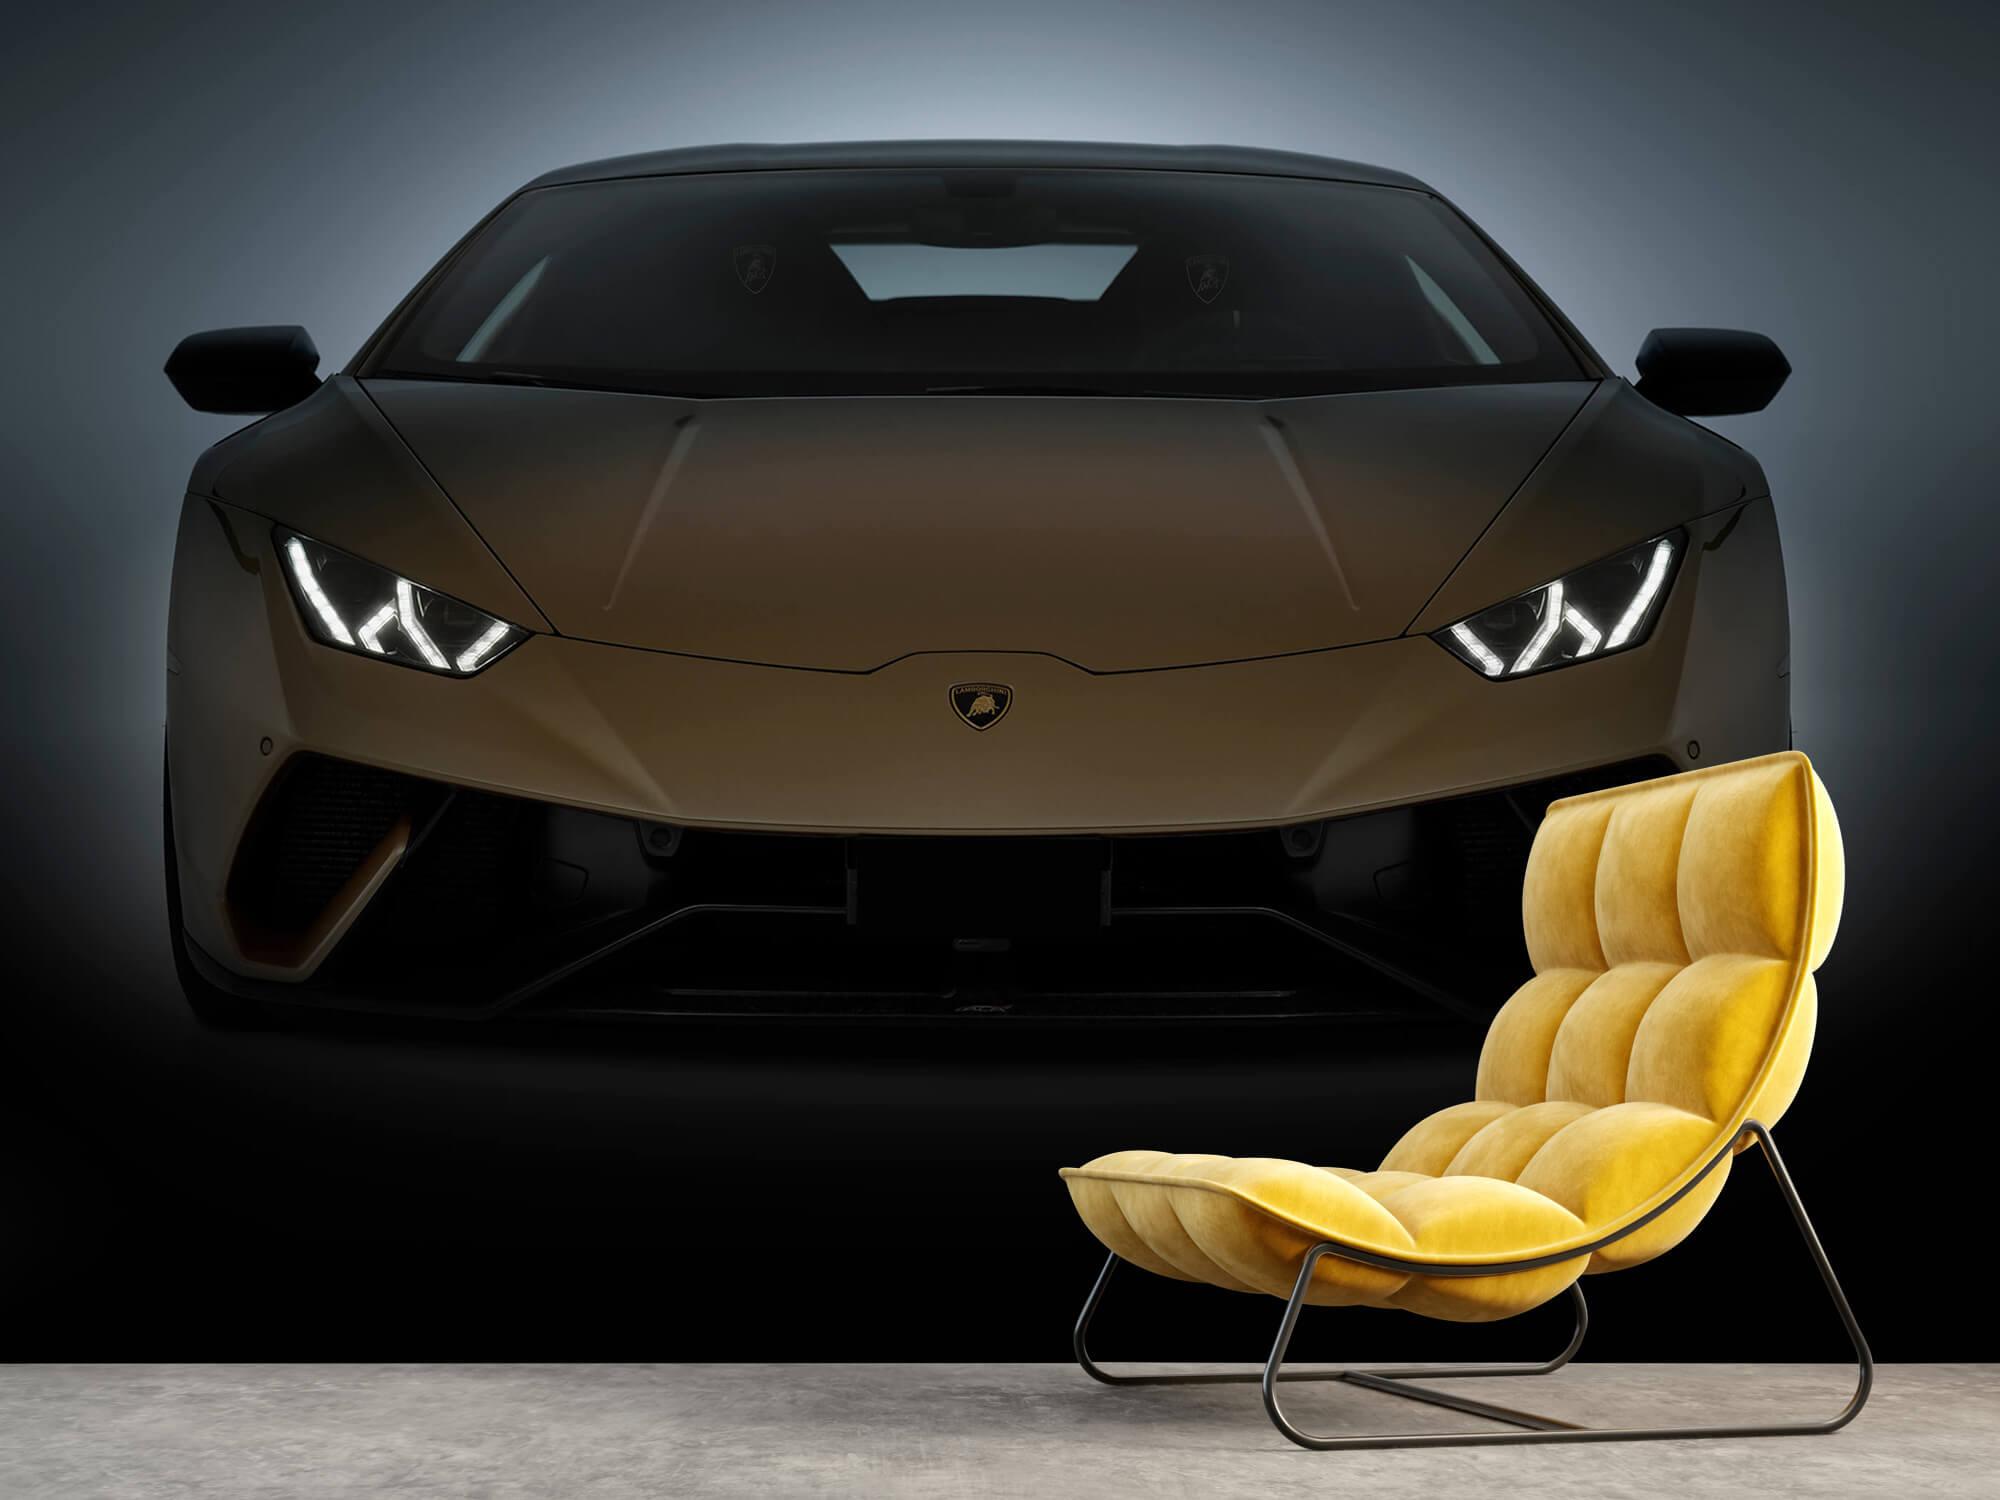 Wallpaper Lamborghini Huracán - Huracán - Fram 6